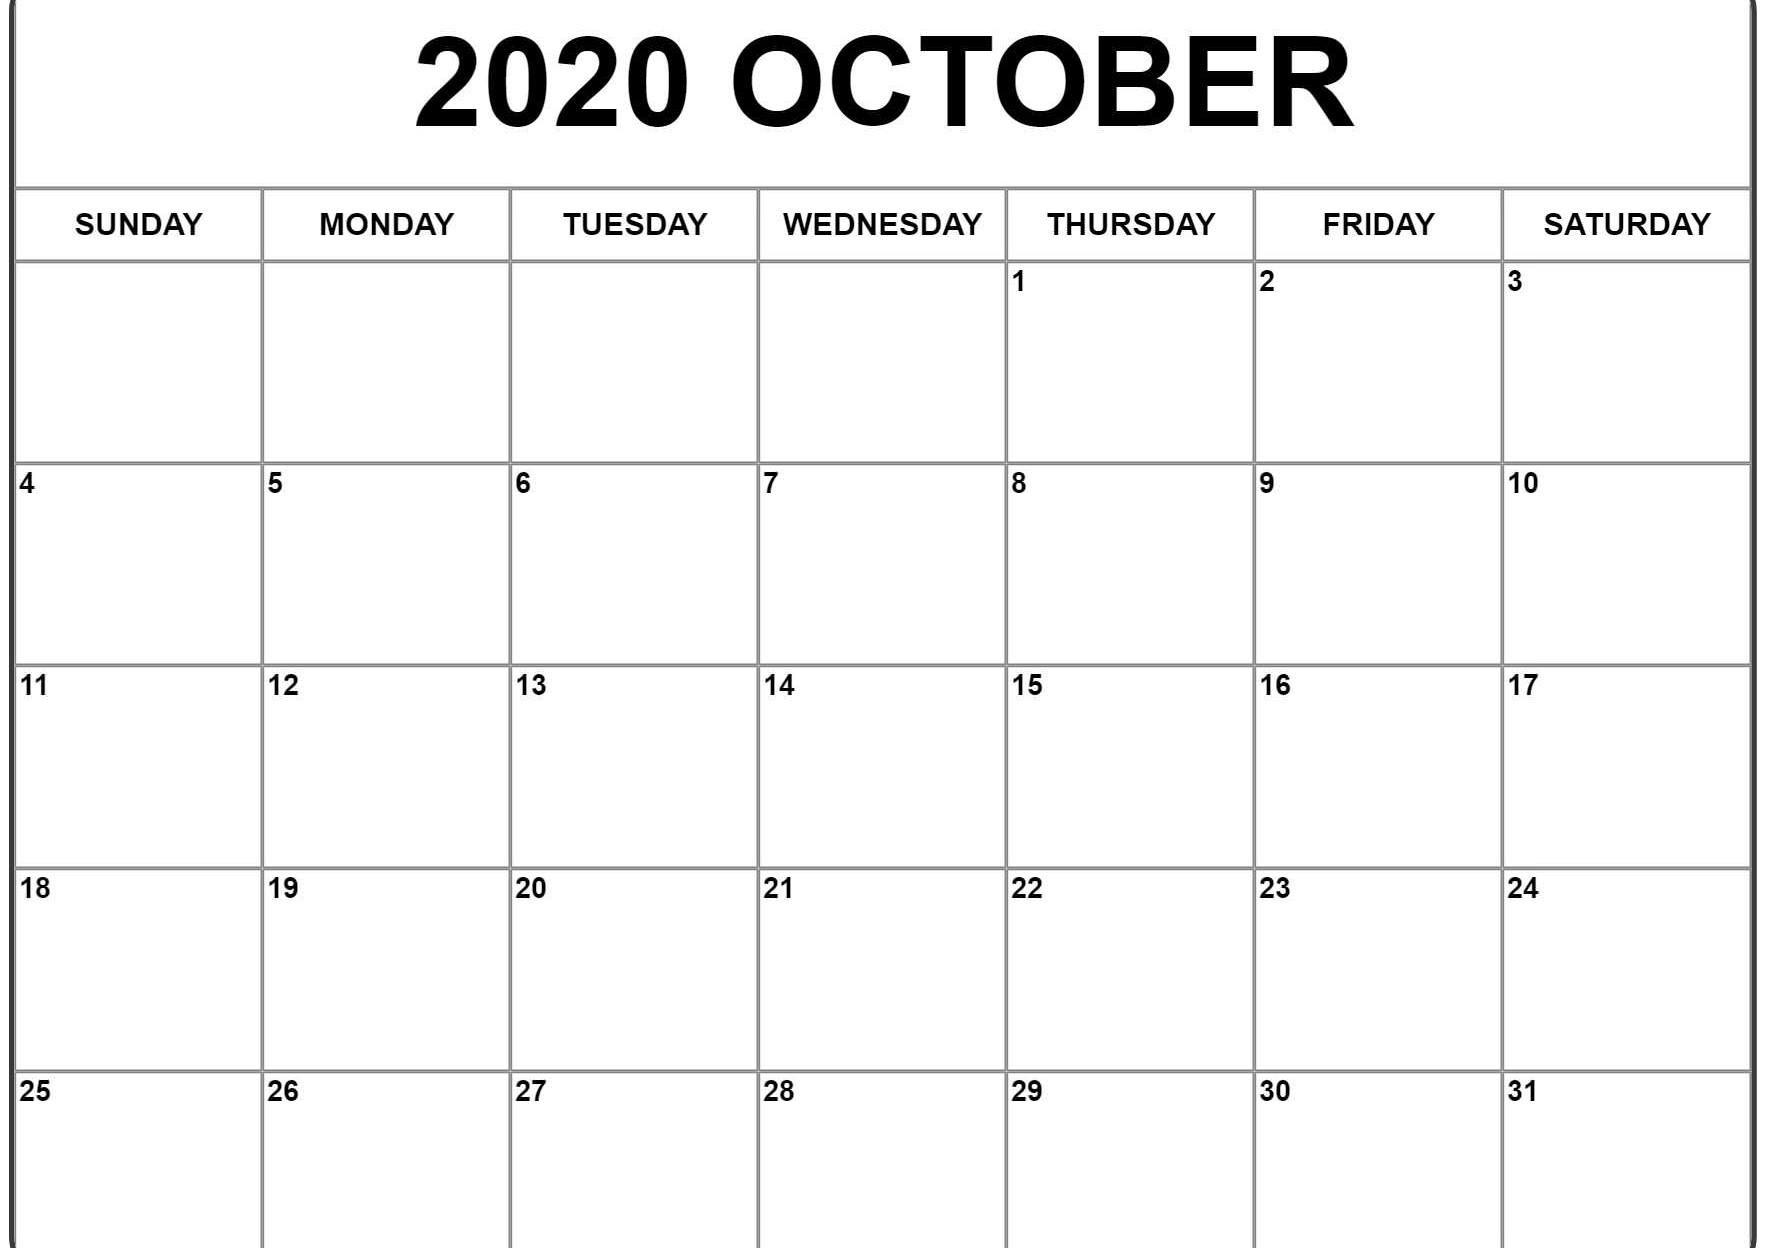 October 2020 Calendar Pdf, Word, Excel Template 2 | October